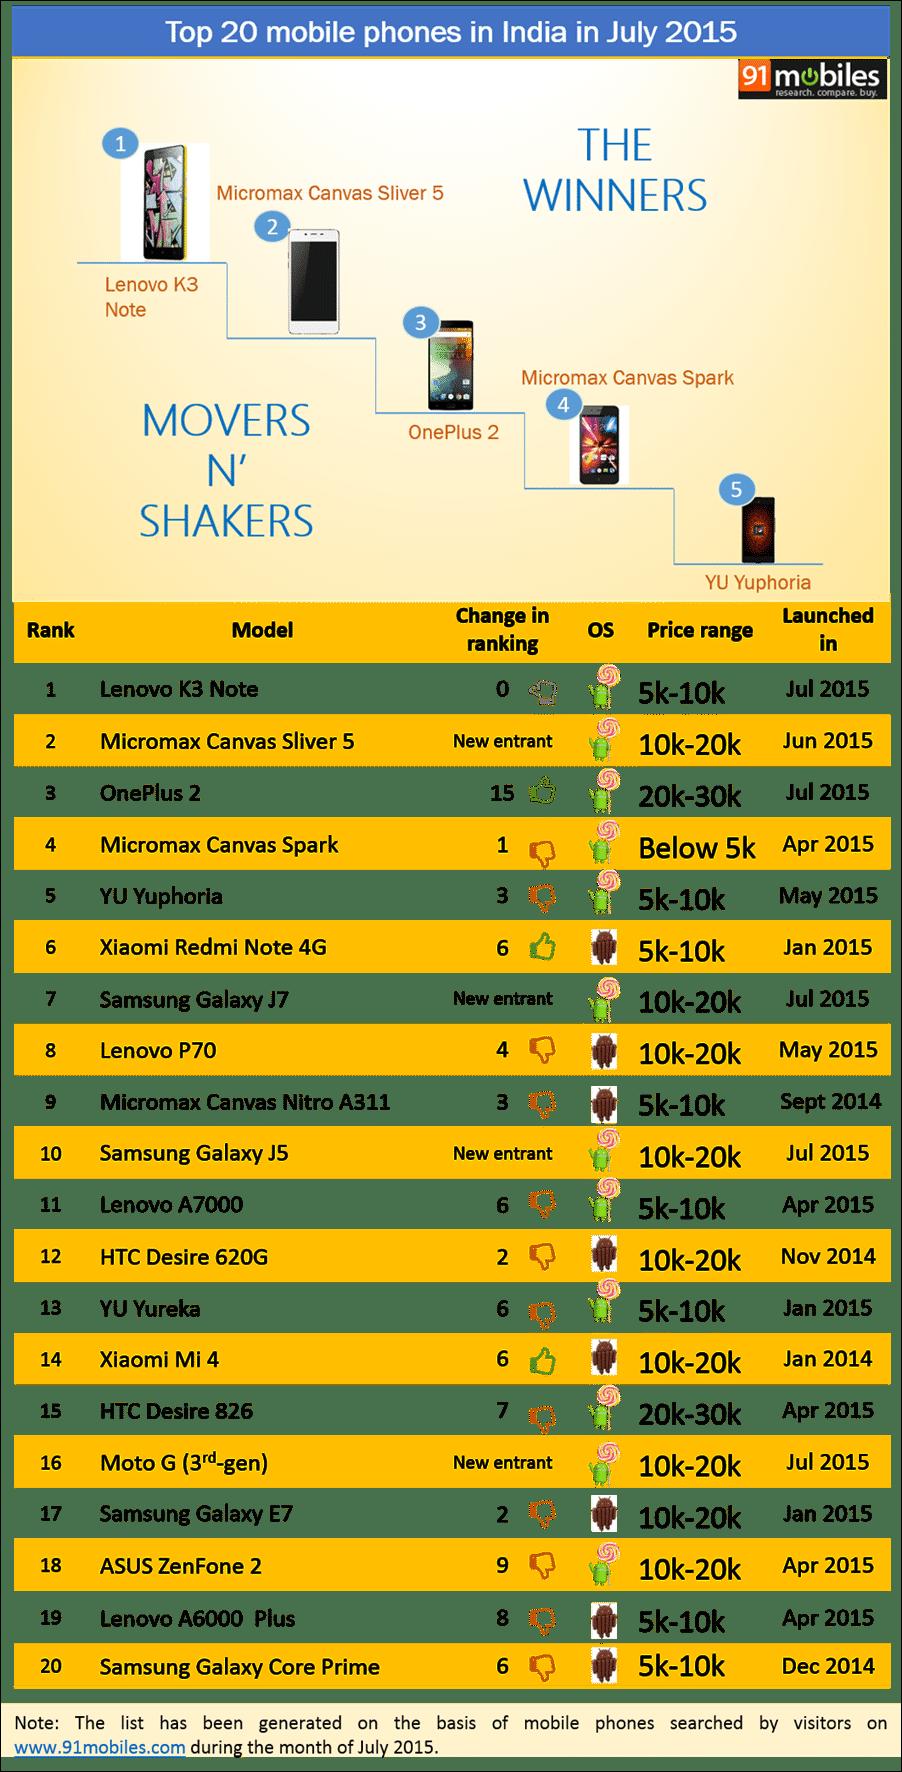 Top 20 mobiles phones in India in July 2015